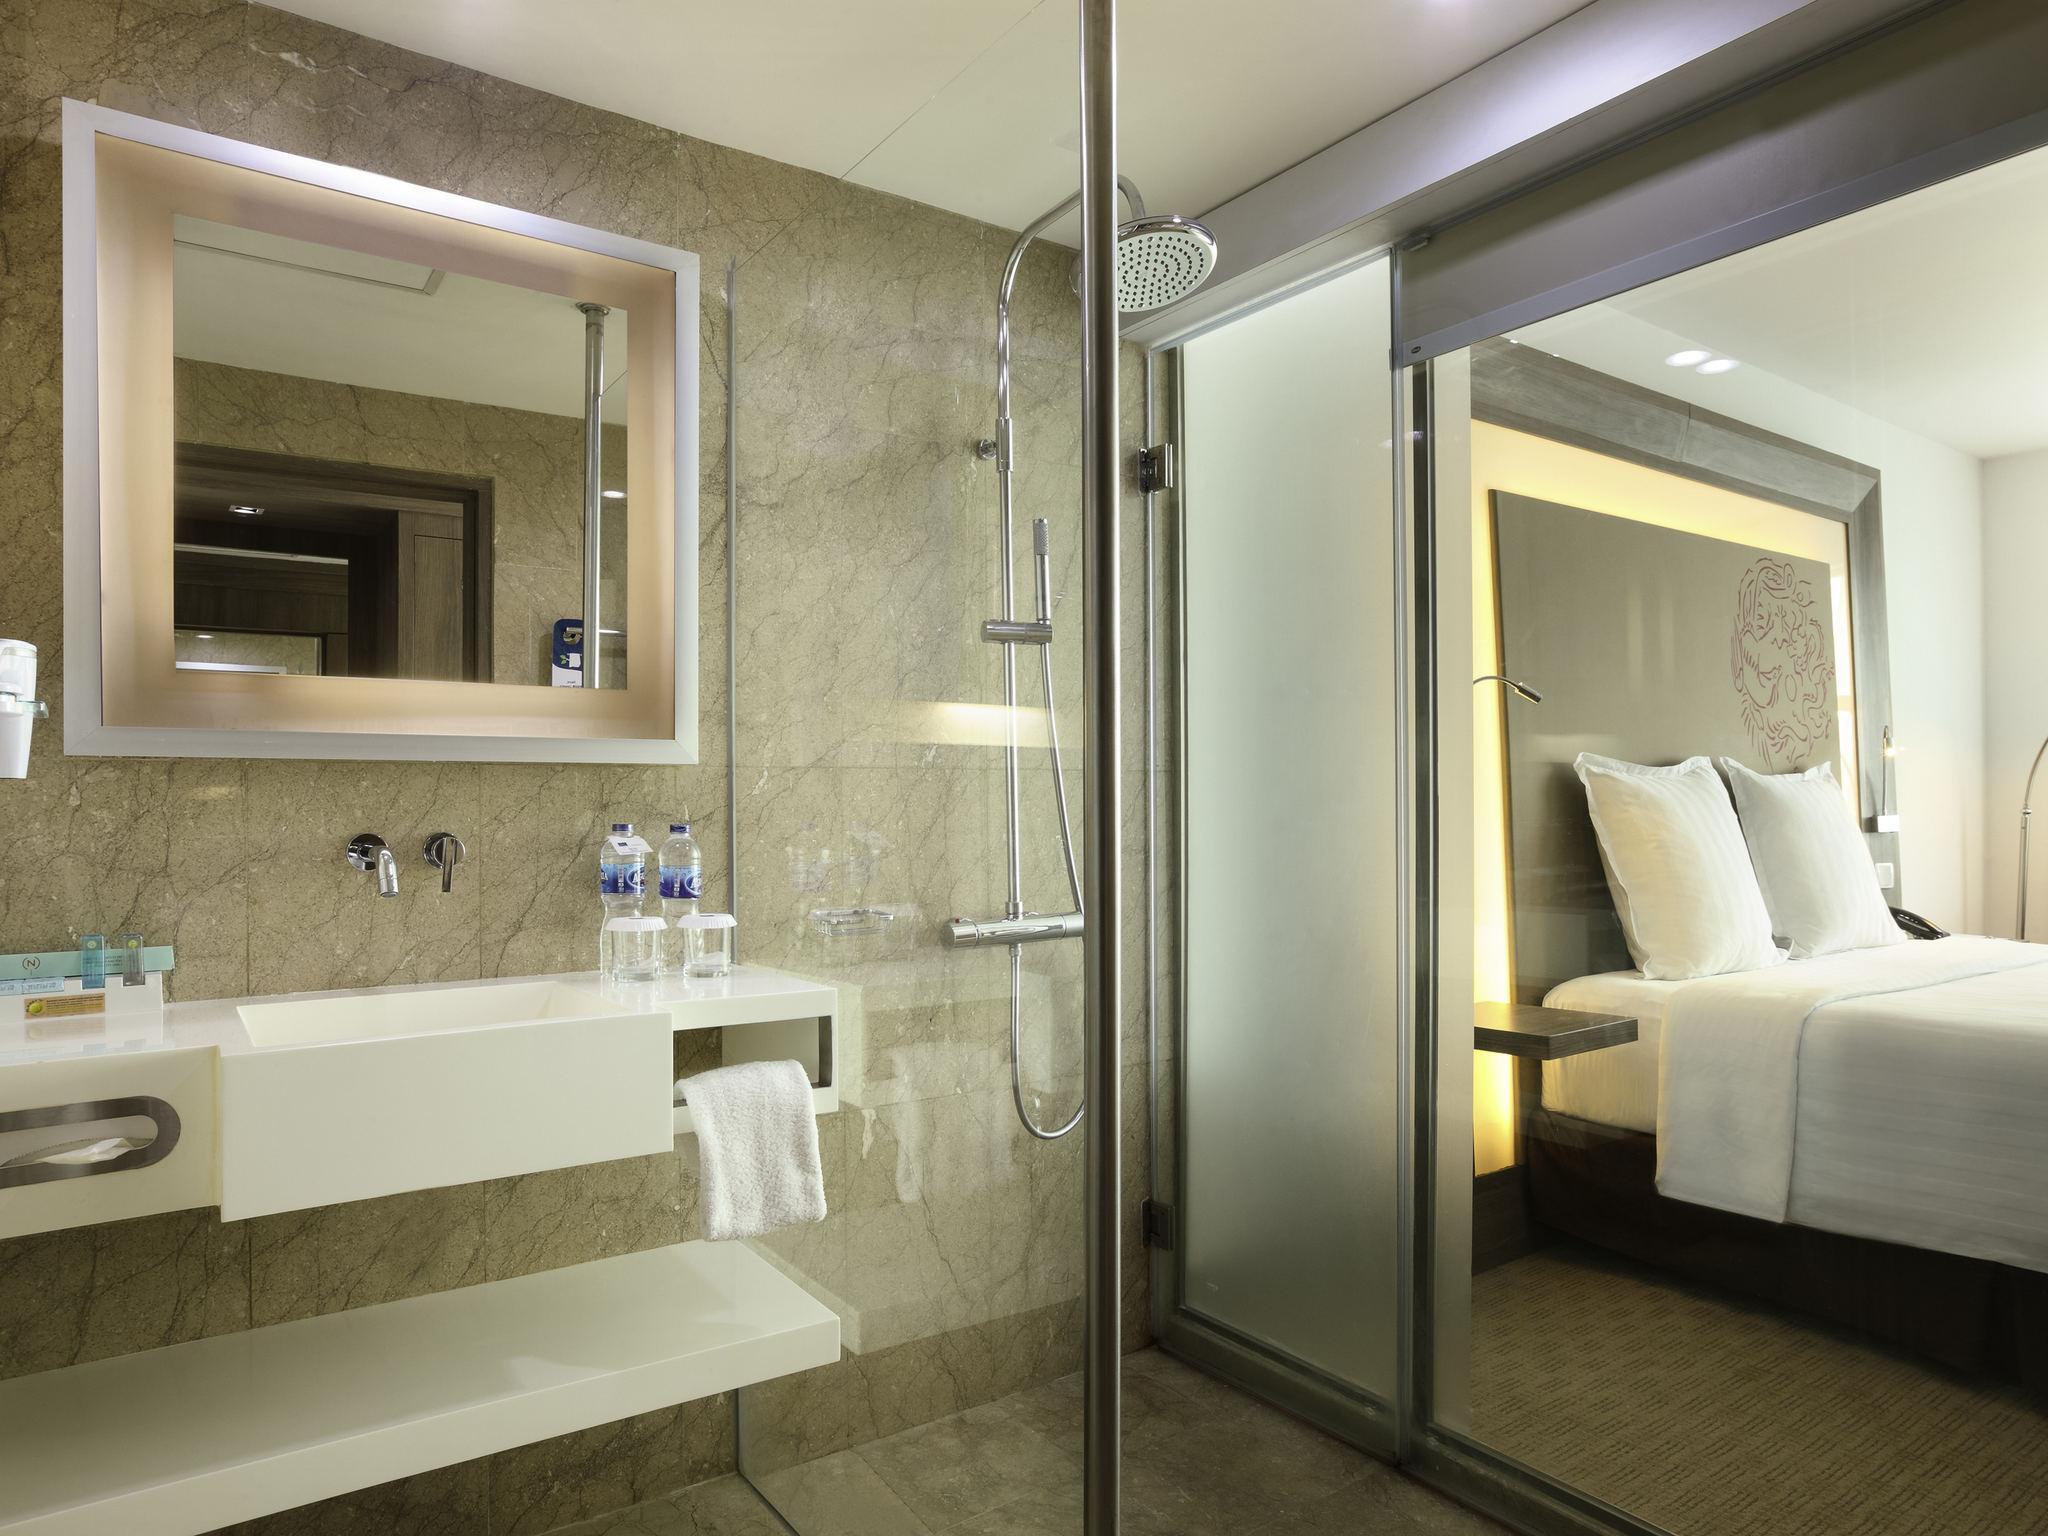 Novotel Jakarta Gajah Mada 4 Star Hotel In Area Paket Murmer Acces Point Komplit Rooms